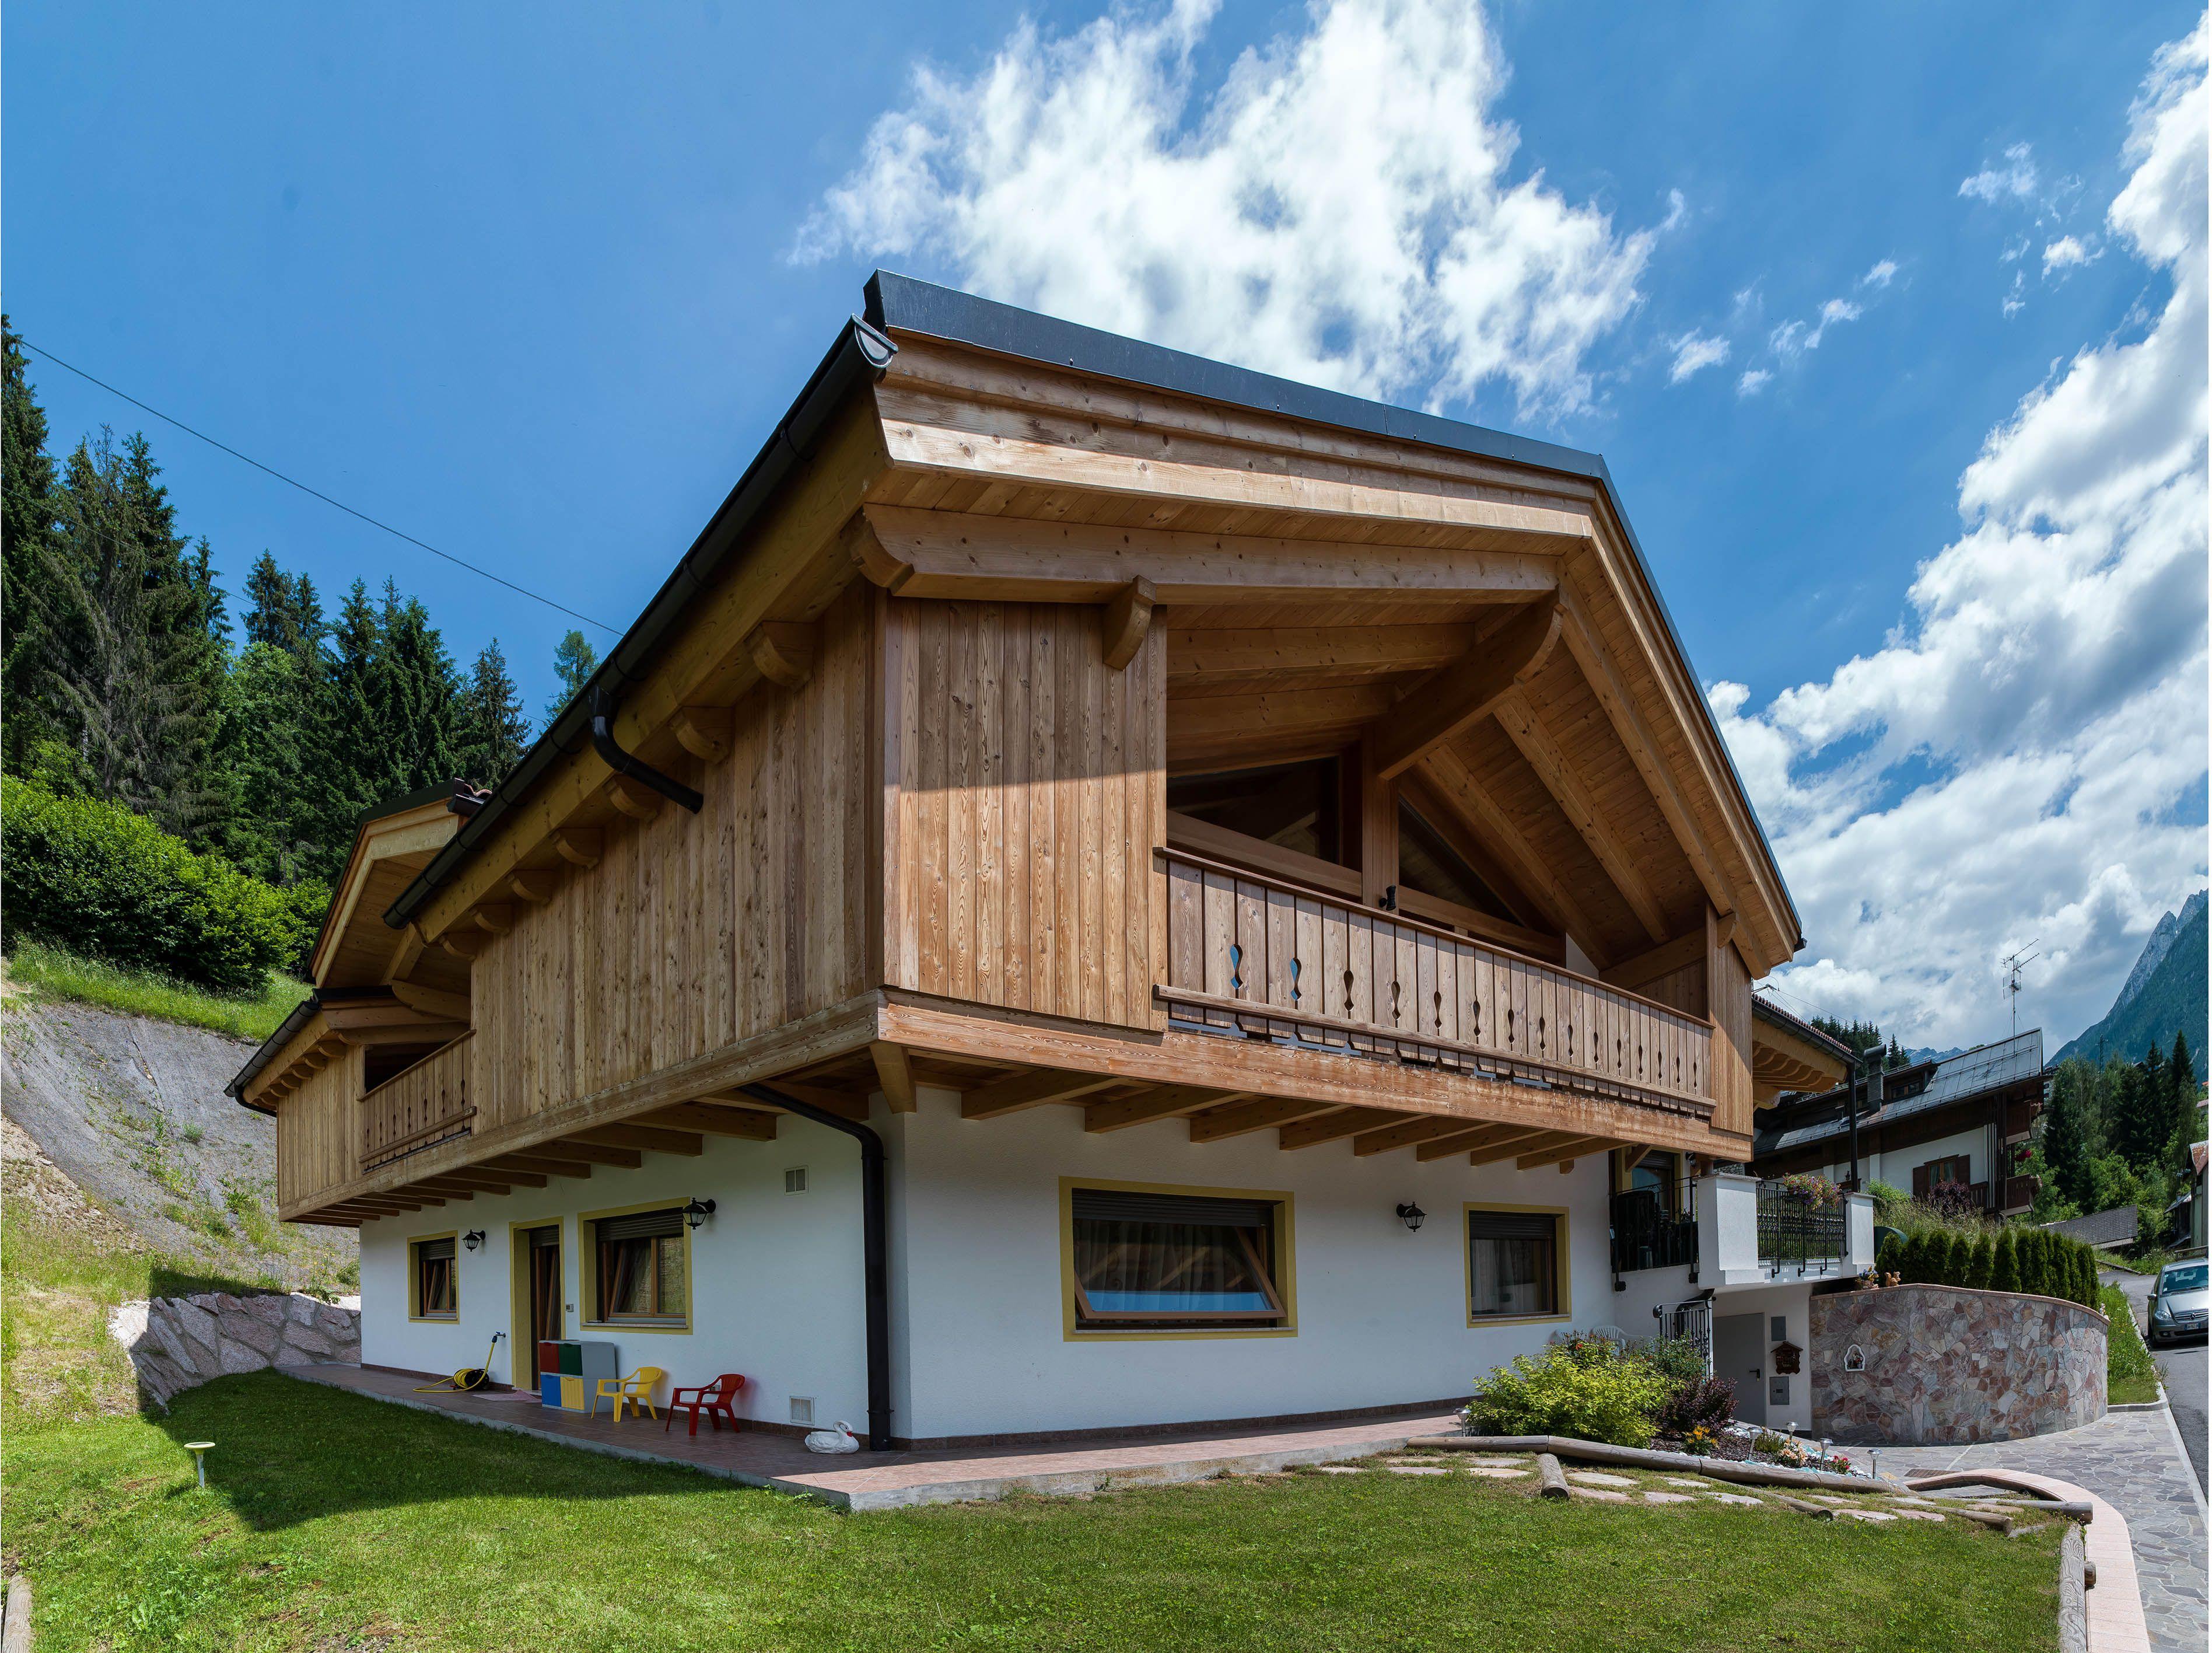 Design in legno Rubner Haus | Casa Rubner 102 | Pinterest